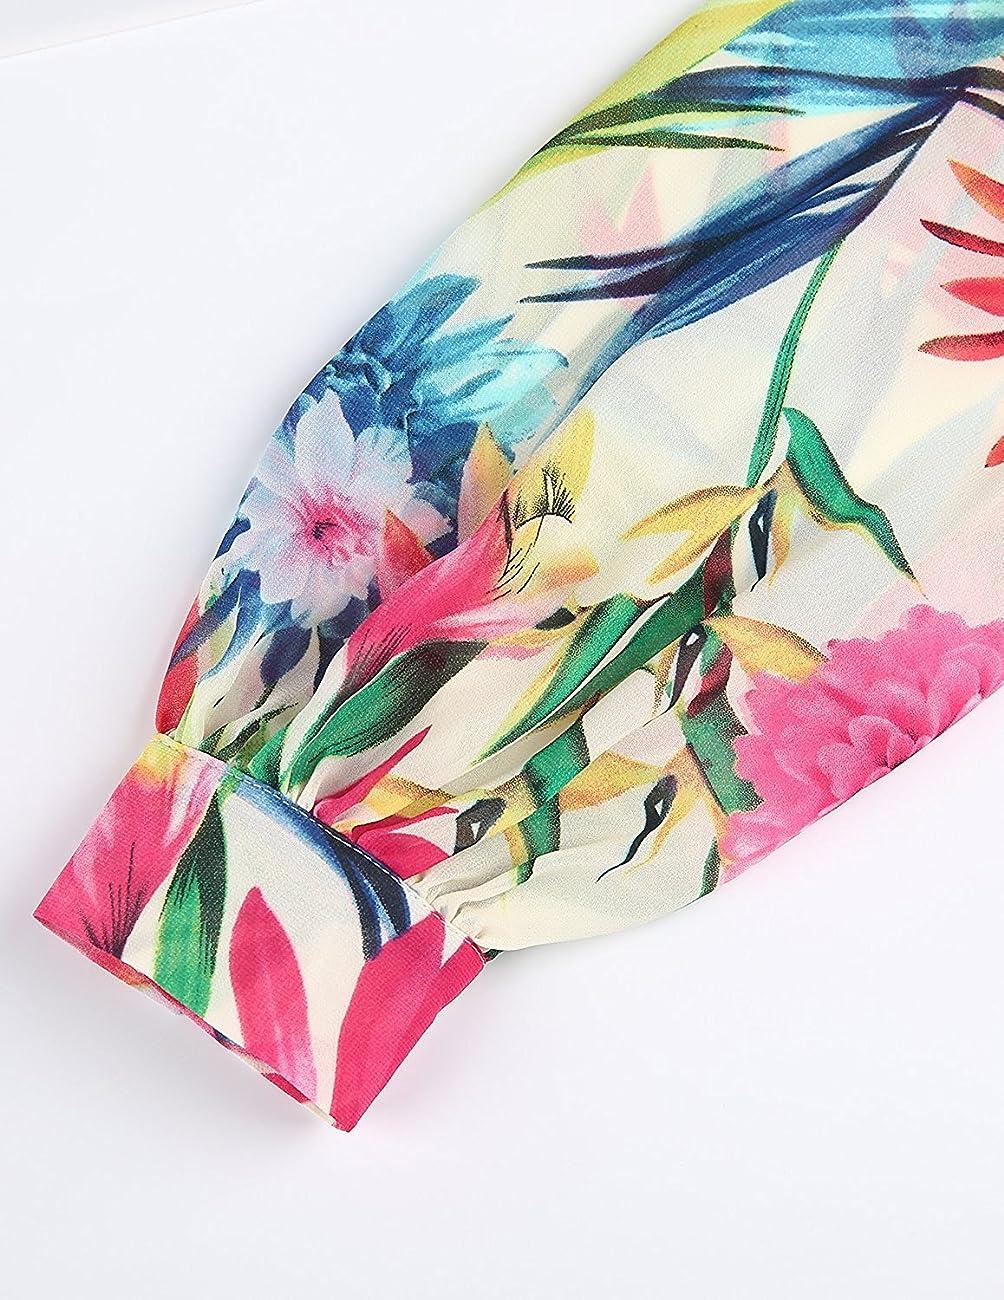 Haoyihui Vintage Style Chiffon V Neck Puff Pleated Wrap Long Maxi Full-Skirted Dress 5